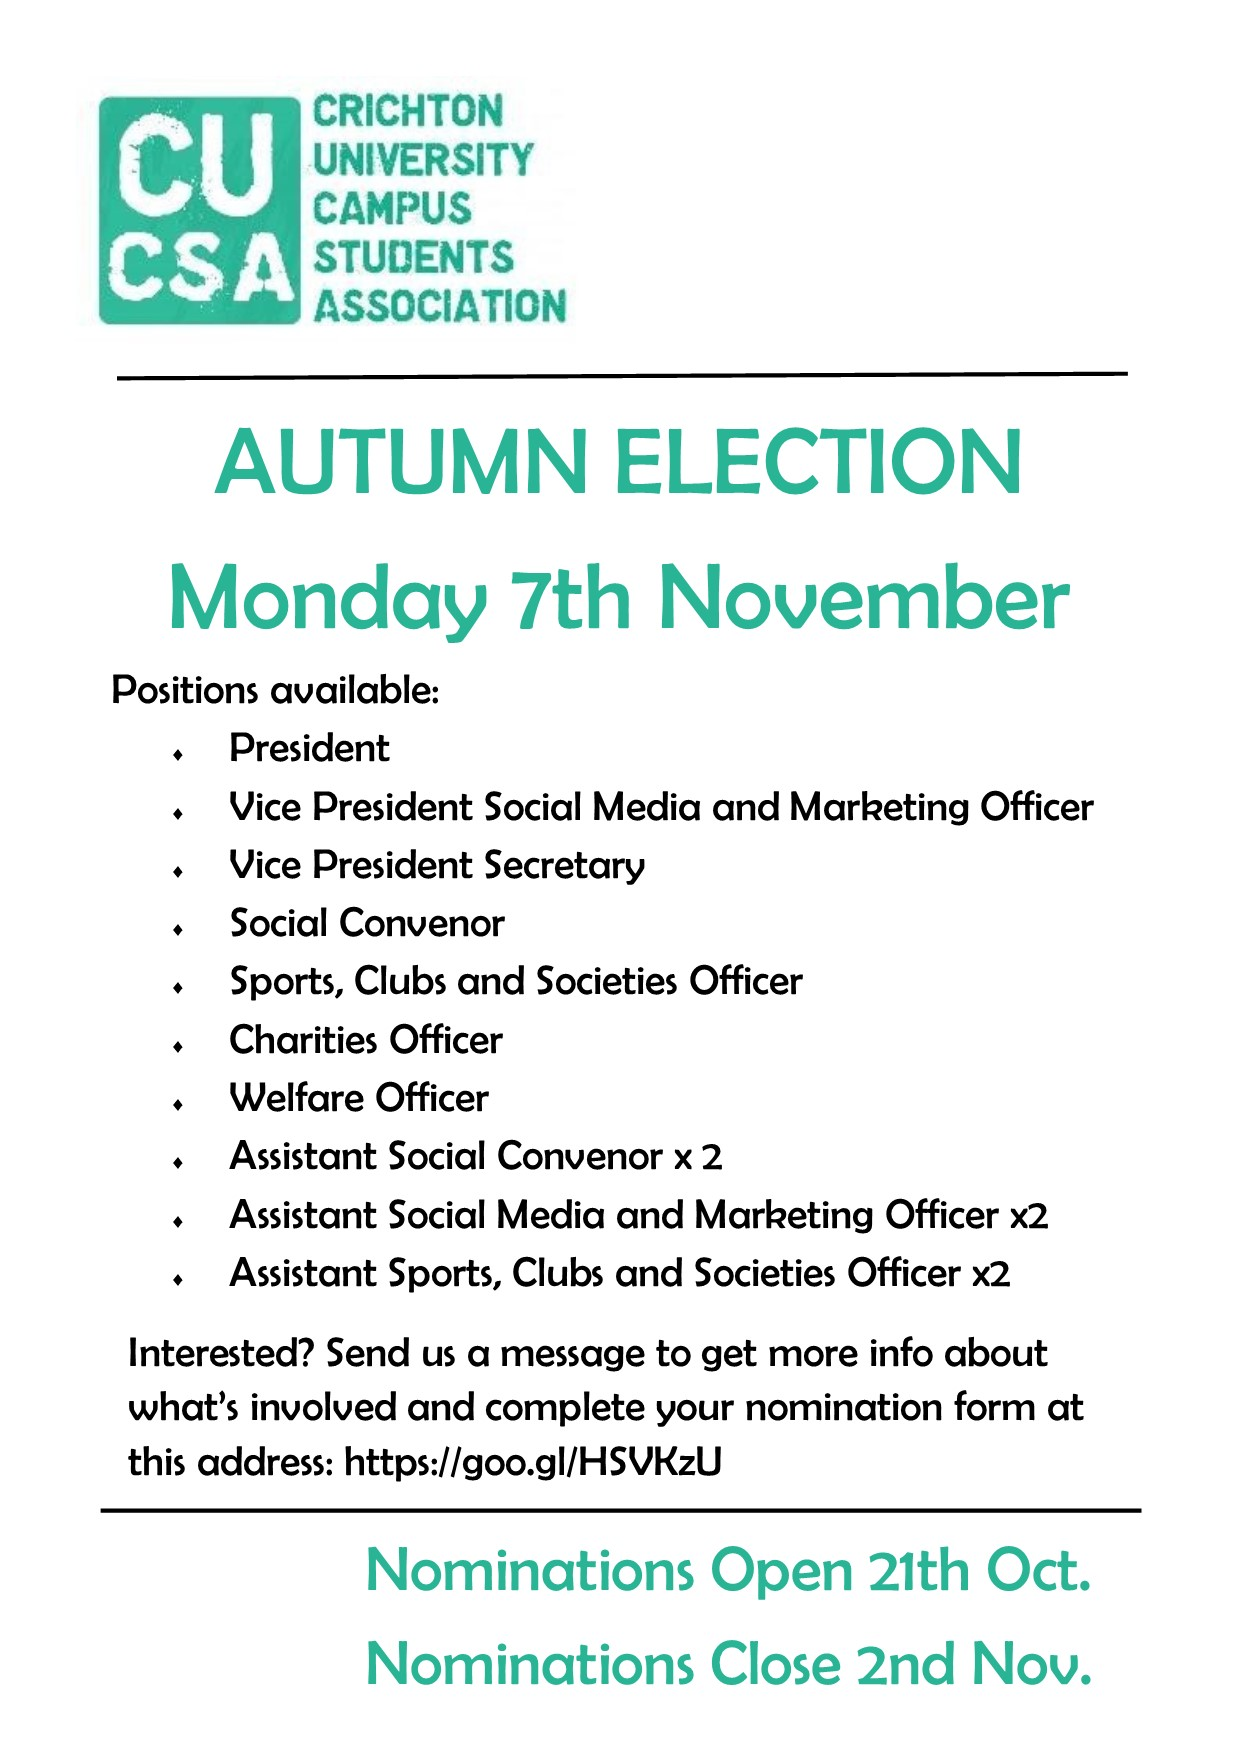 cucsa-autumn-election-2016